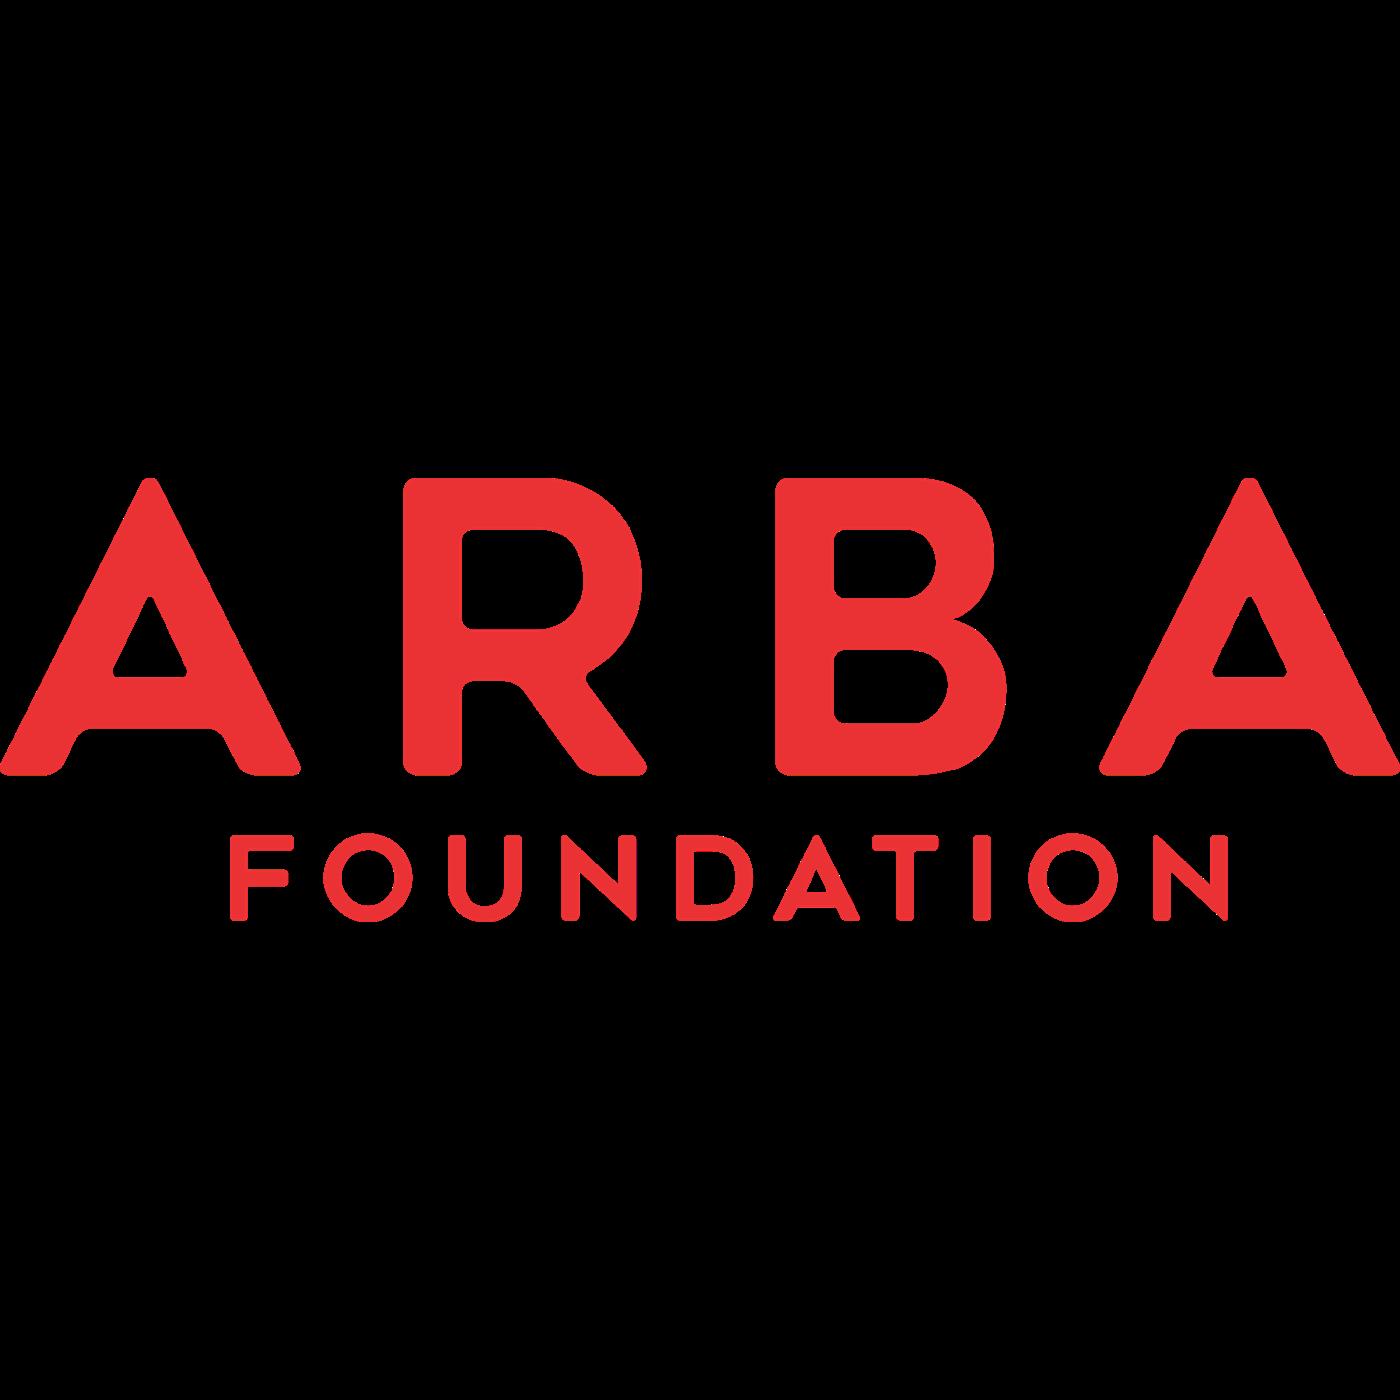 Arba Foundation